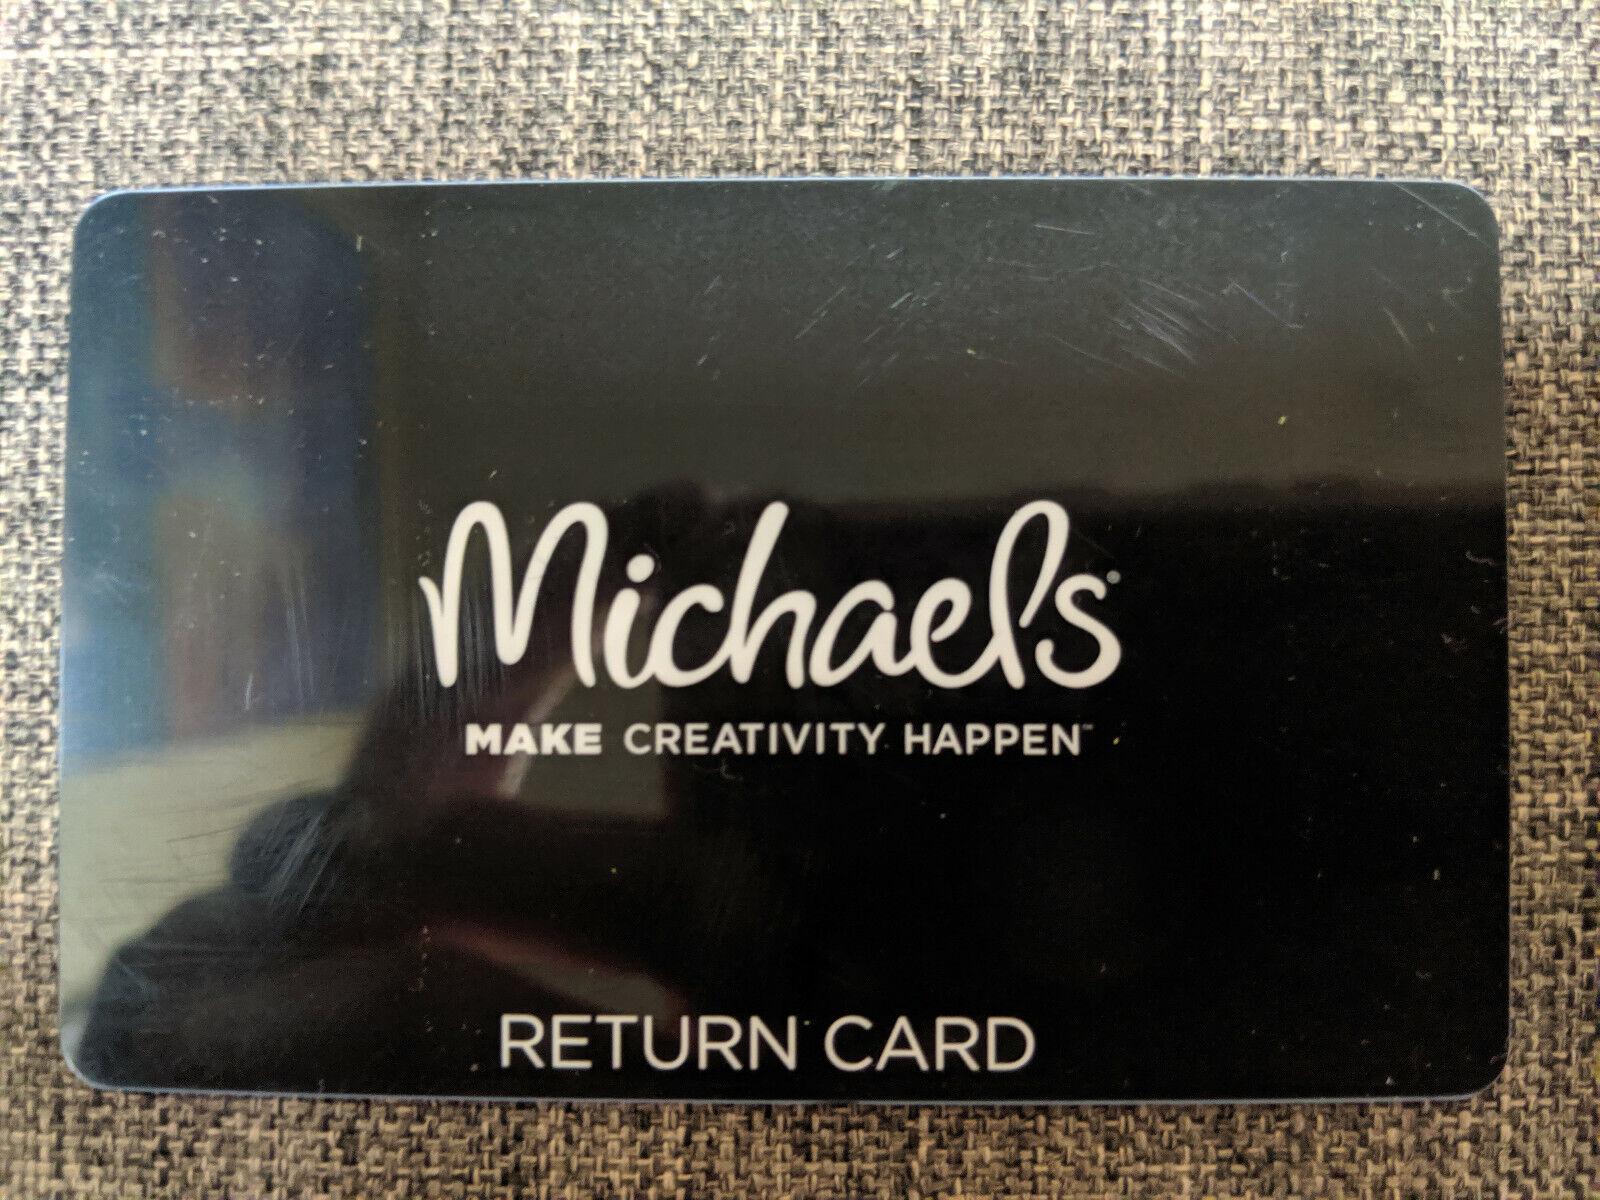 76.00 Michaels Gift Card Merchandise Credit BALANCE 76.00 - $66.00